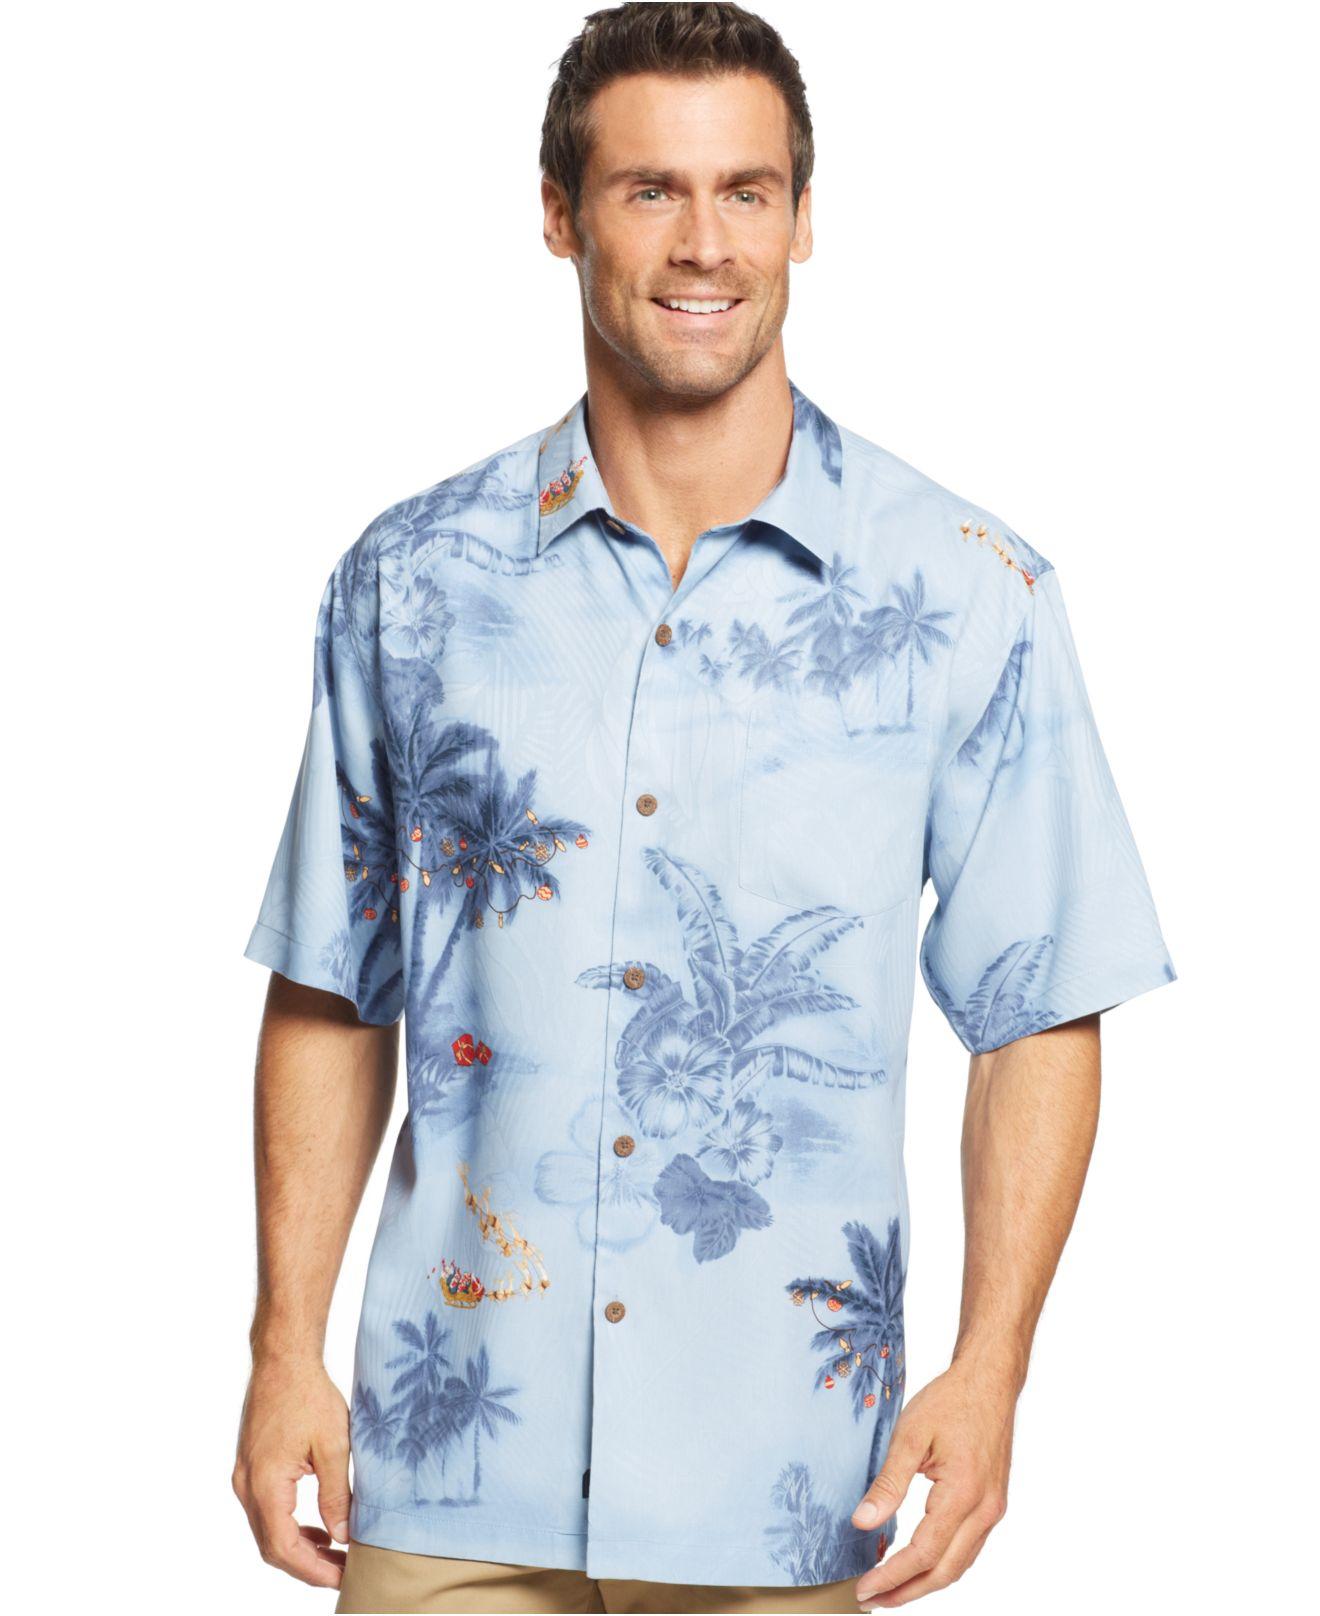 Tommy Bahama Dashing Through The Palms Silk Shirt In Blue